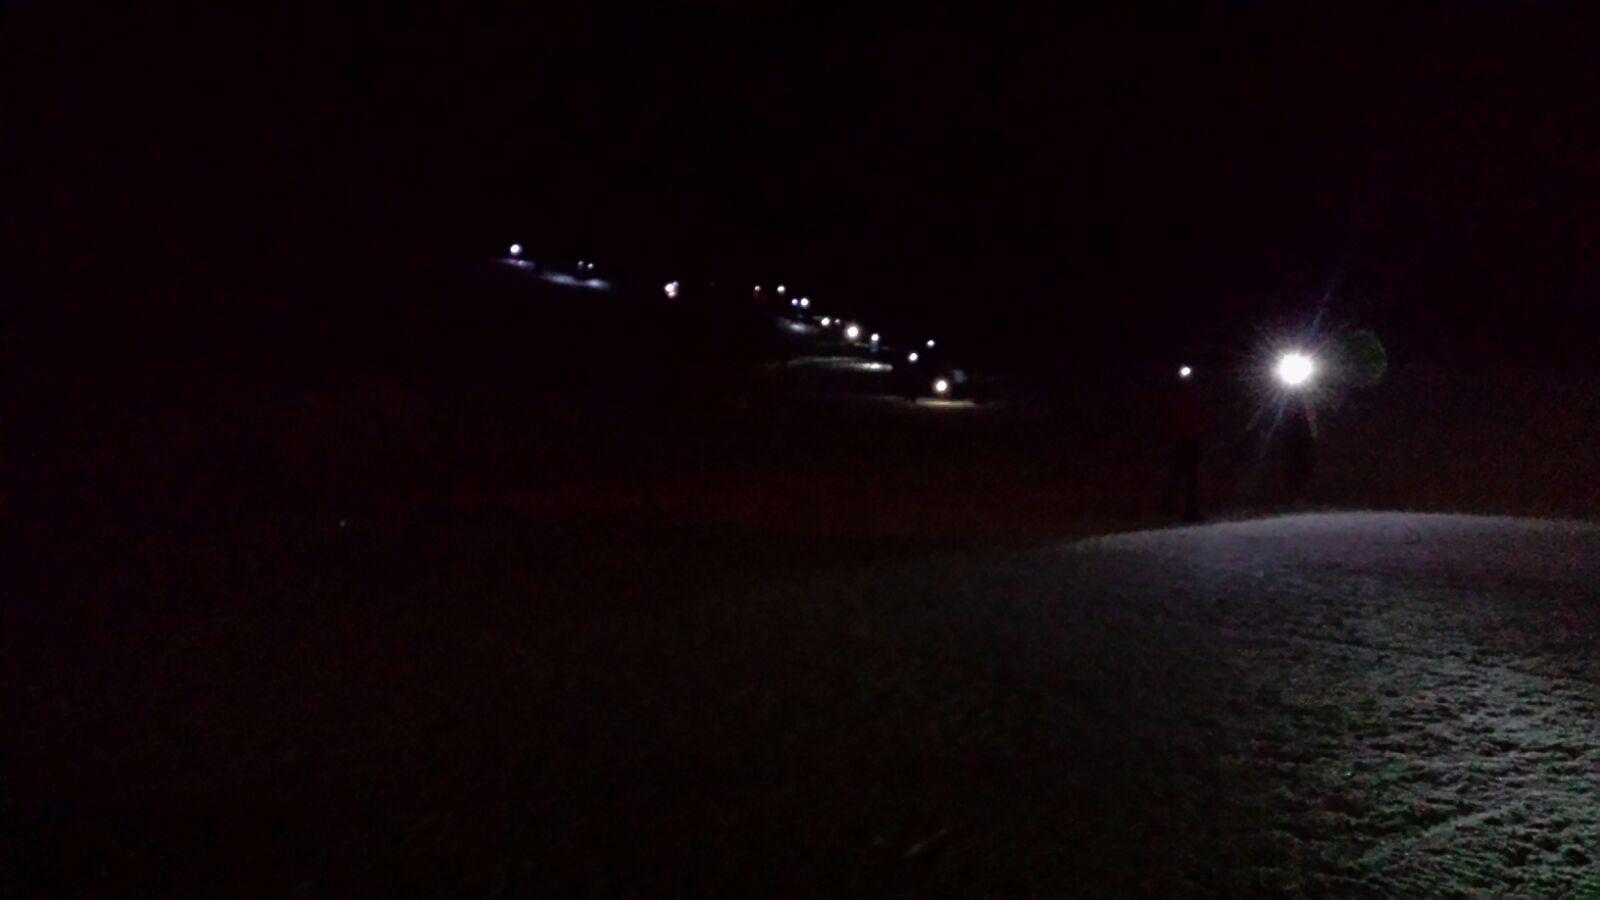 Ciaspolata notturna 28 gennaio 2017